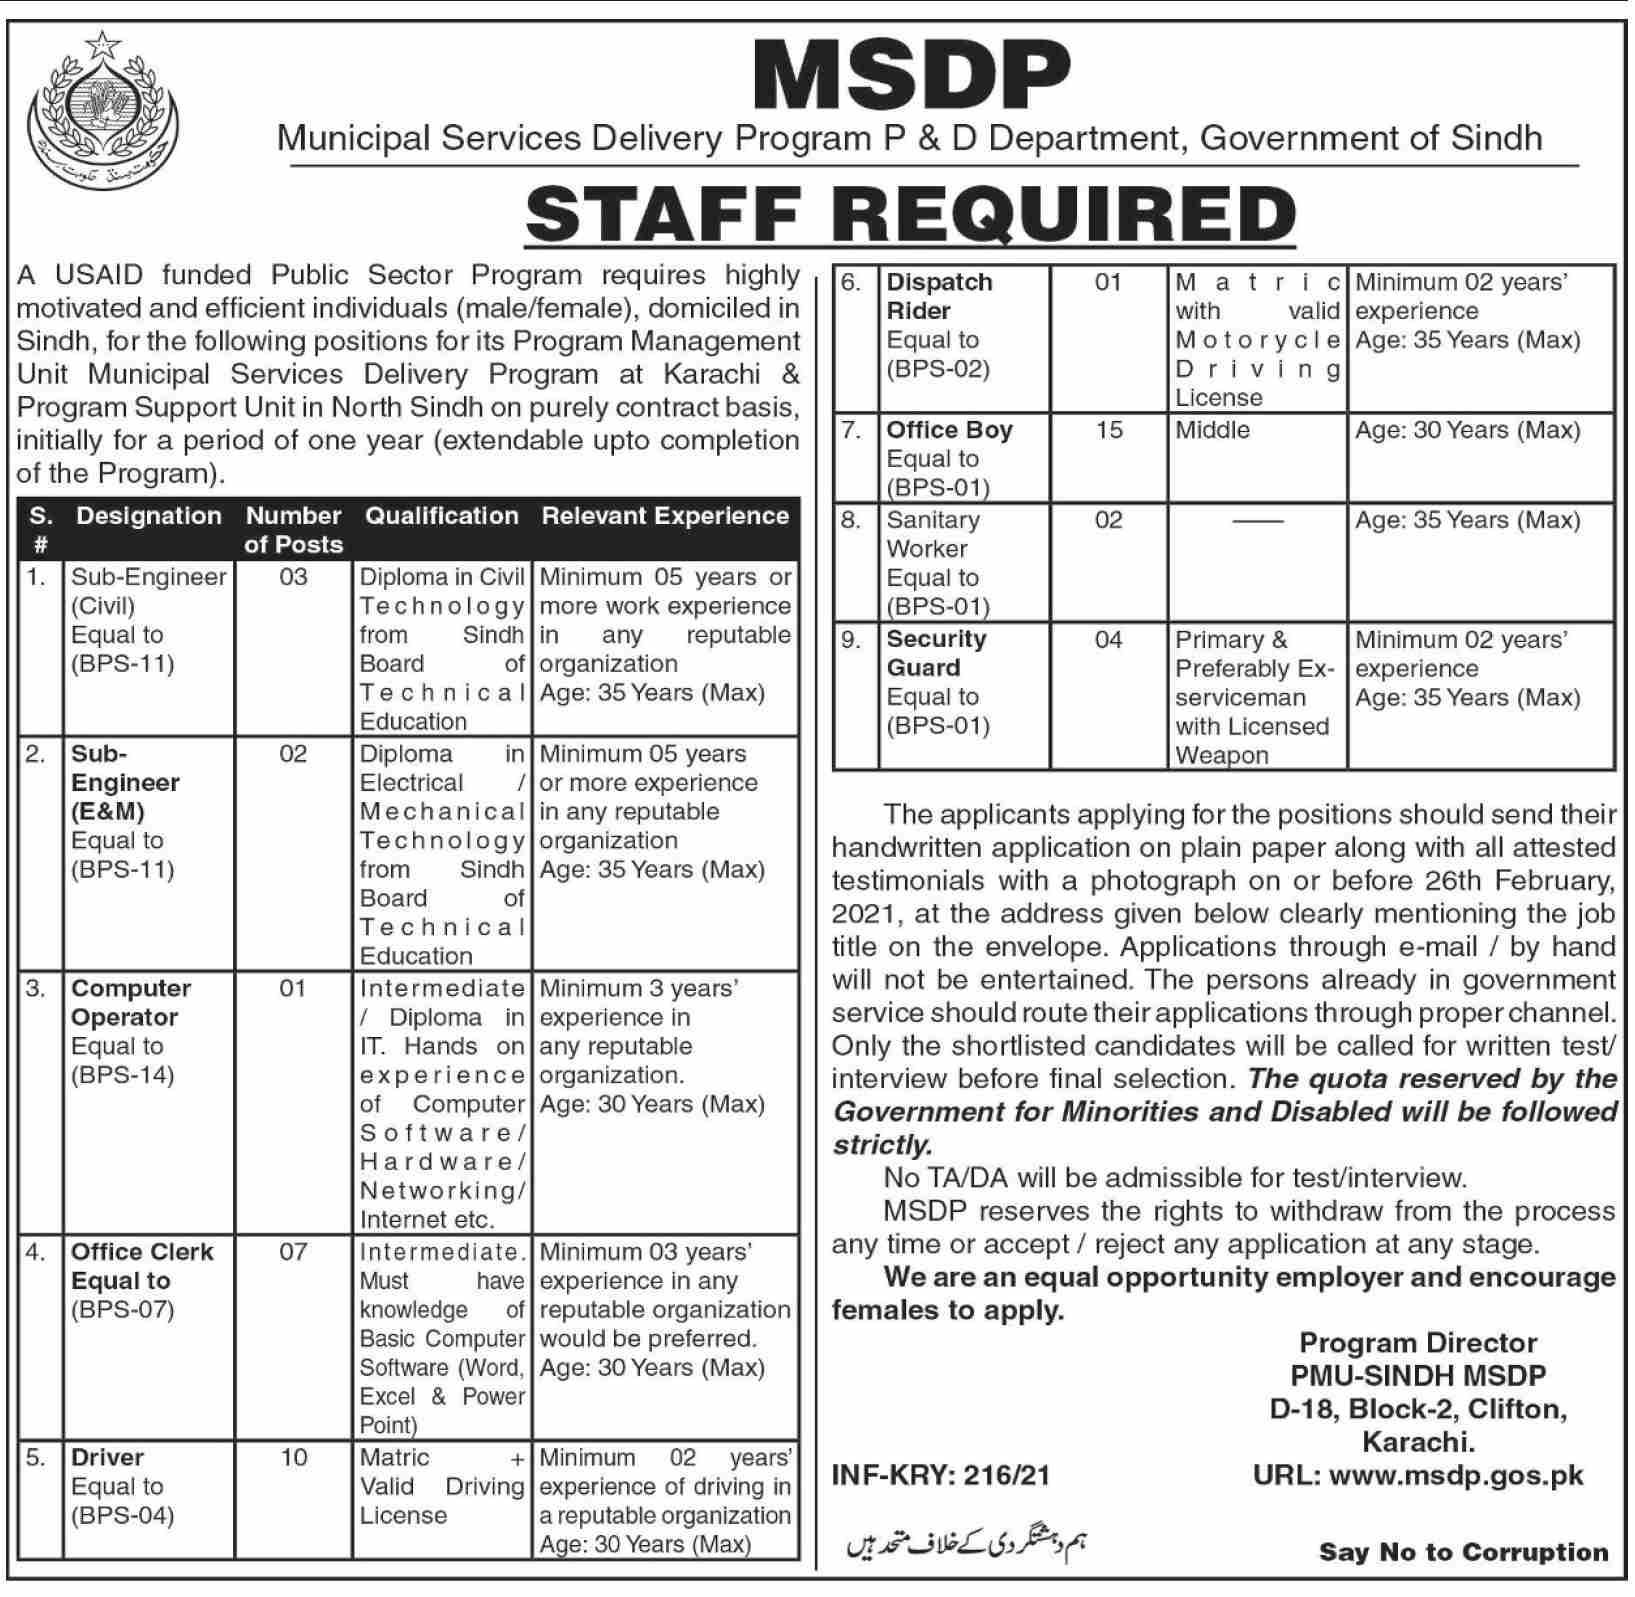 Municipal Services Delivery Program MSDP Jobs 2021 - P&D Department Jobs 2021 - Latest Govt Jobs 2021 - www.msdp.gos.pk